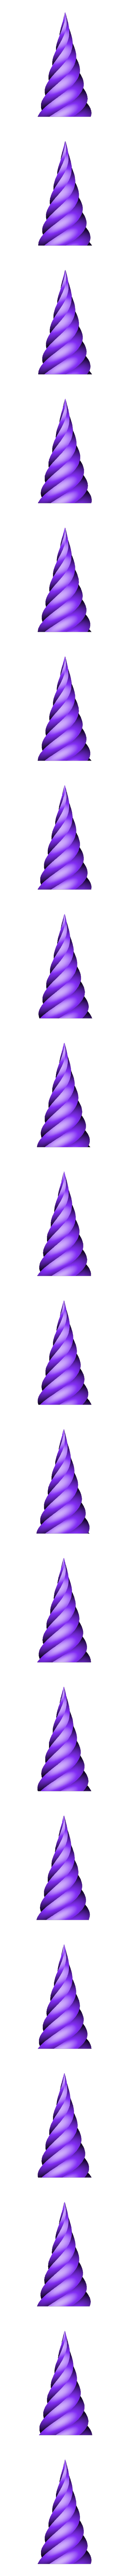 Super Twist.stl Download STL file Really Twisted Christmas Tree • 3D print object, FlyingWeasel